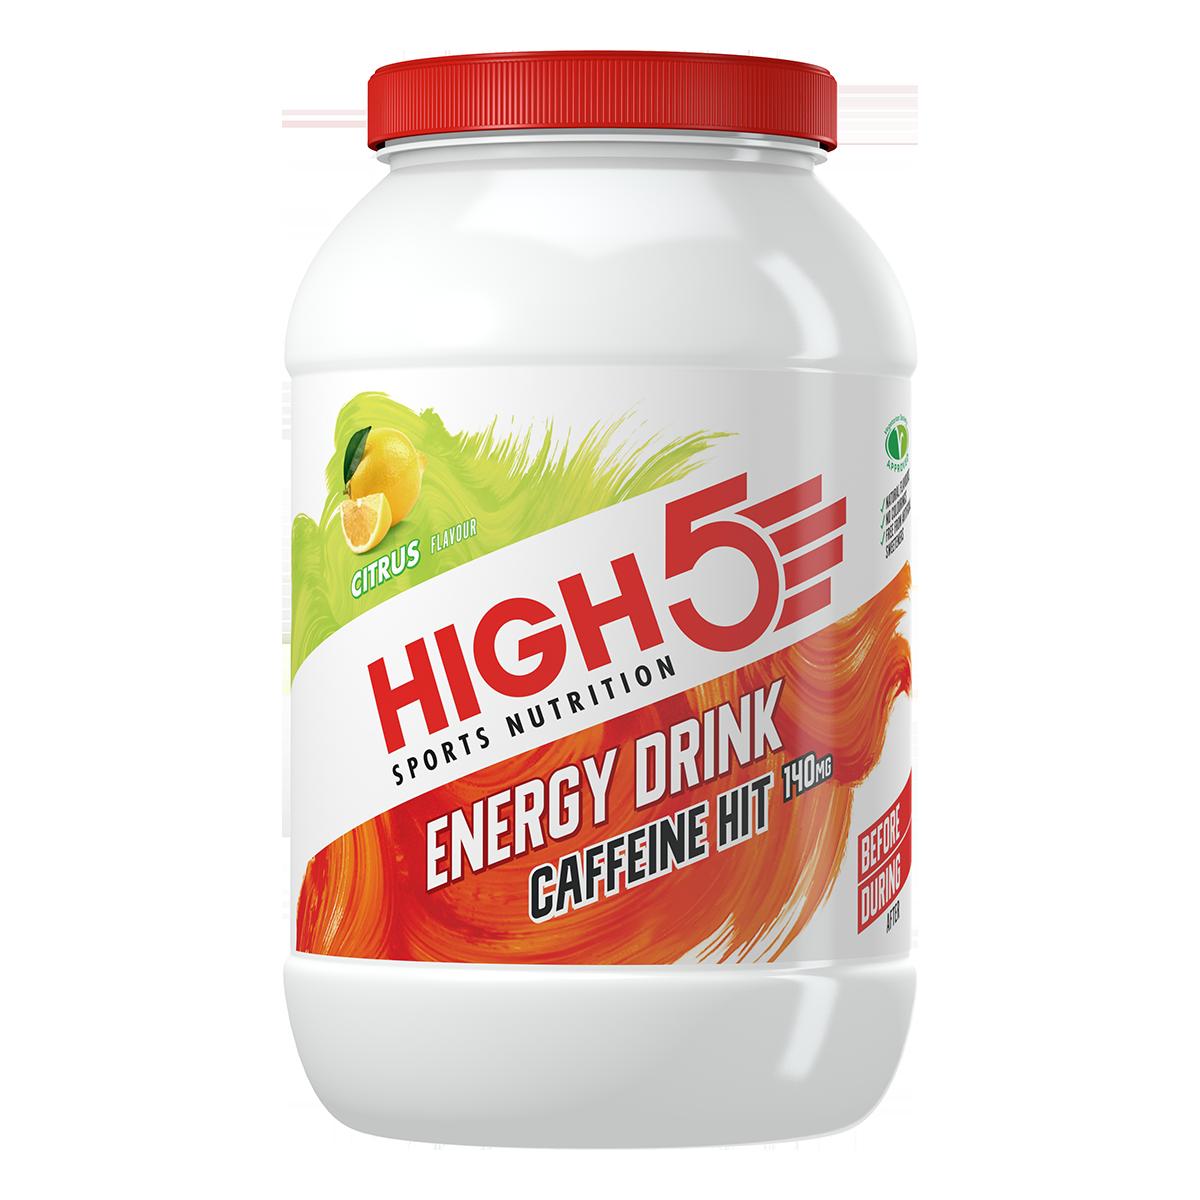 Energy-Drink-Caffeine-Hit_Citrus_1400g_Front_RGB_1200x1200.png